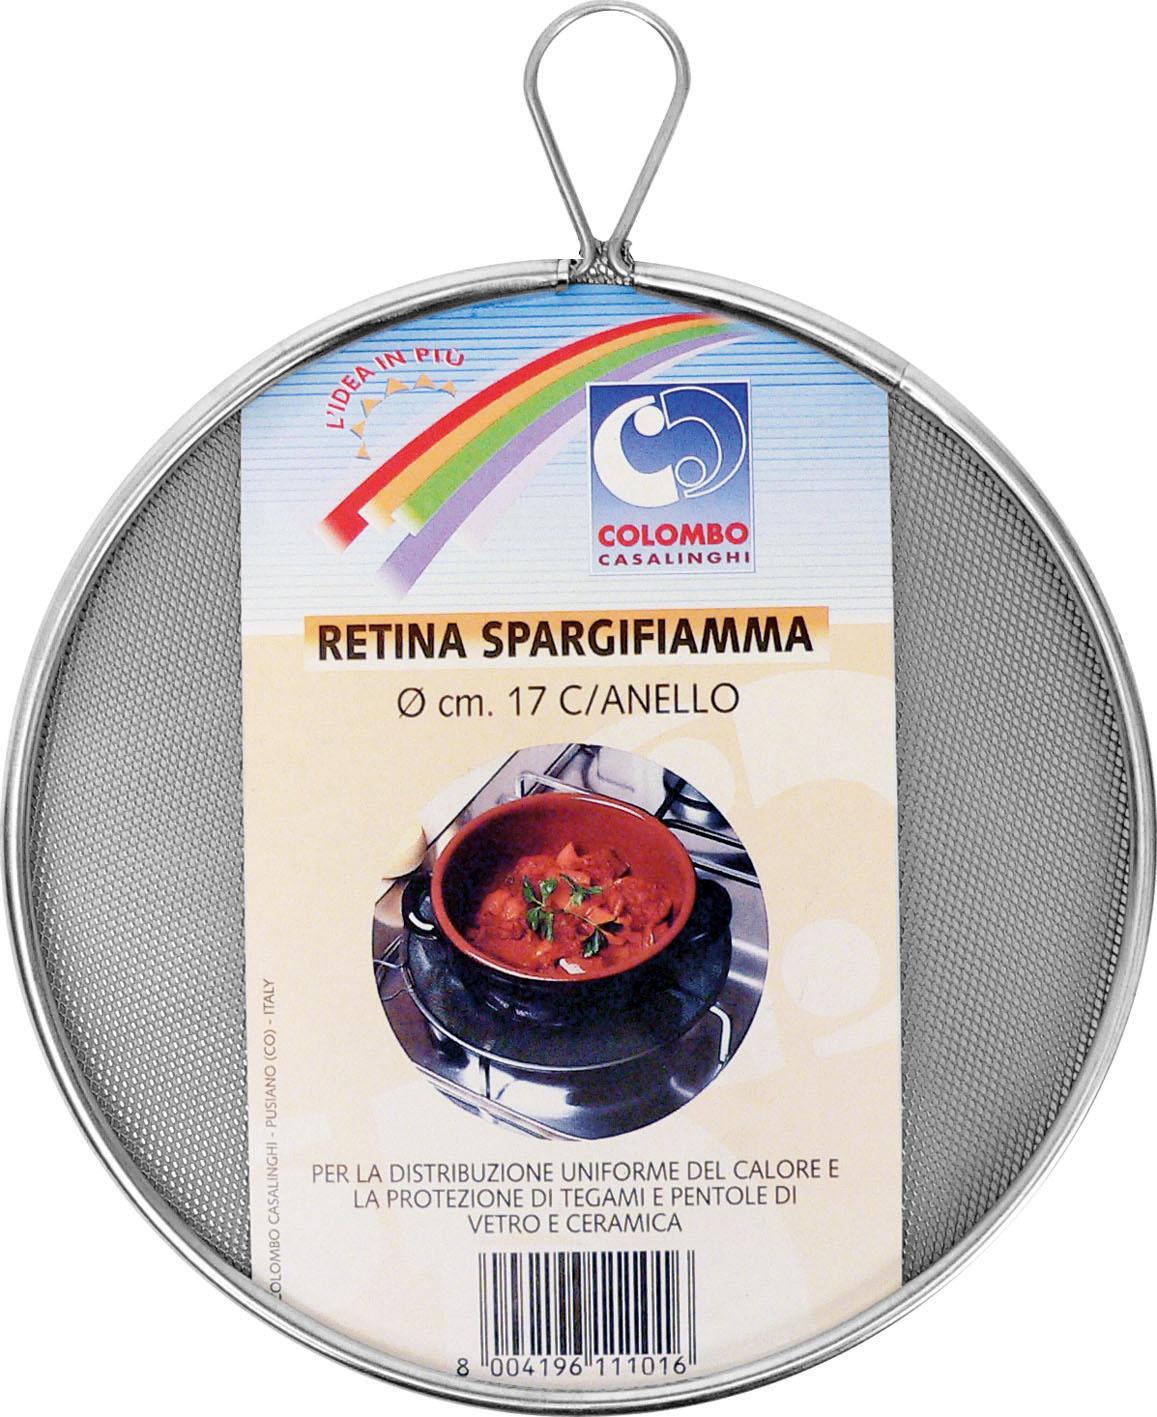 RETINA SPARGIFIAM  C AN  CM 17